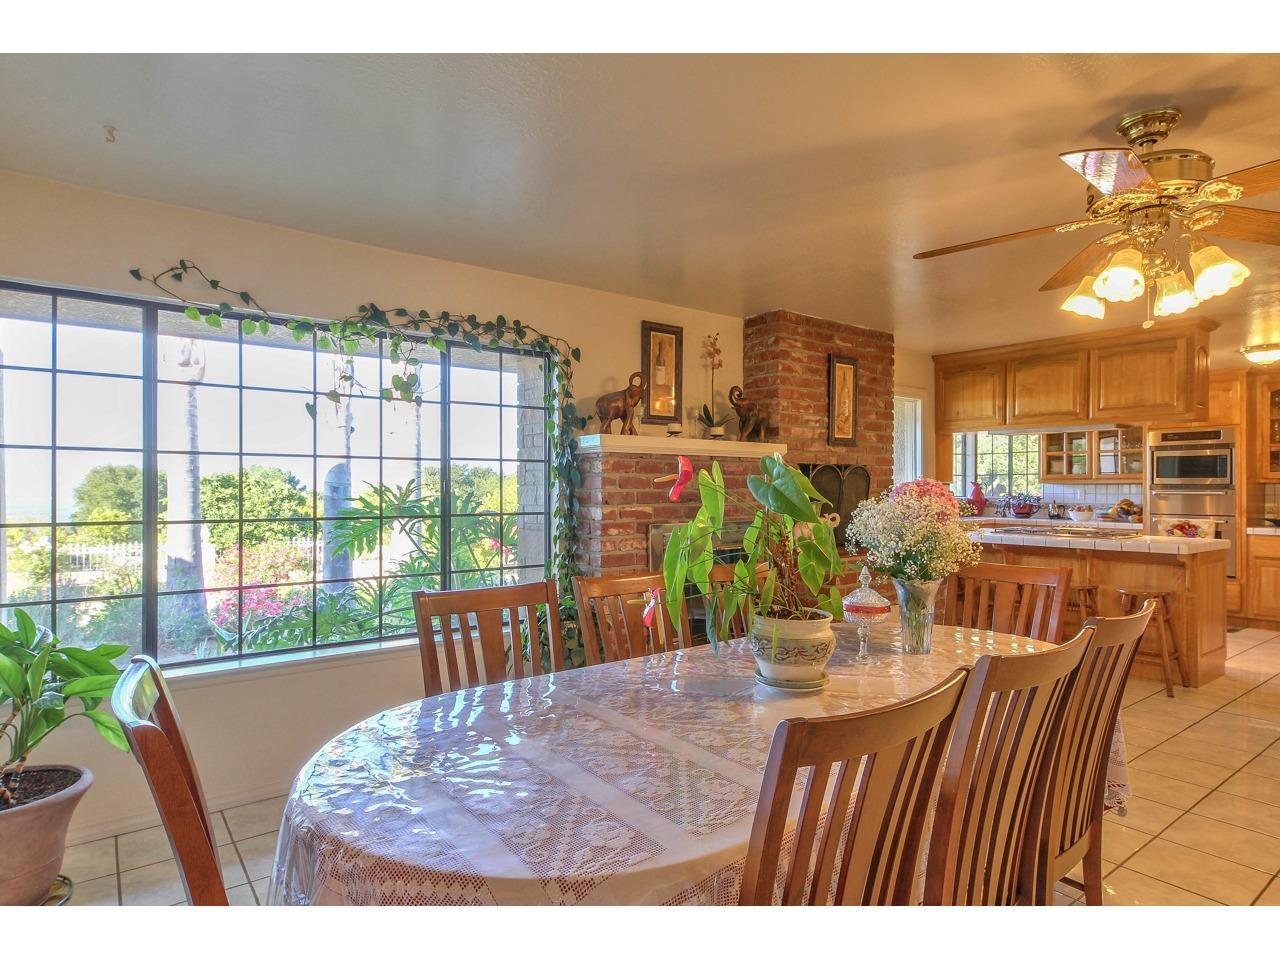 101 Pine Canyon RD Salinas, CA 93908